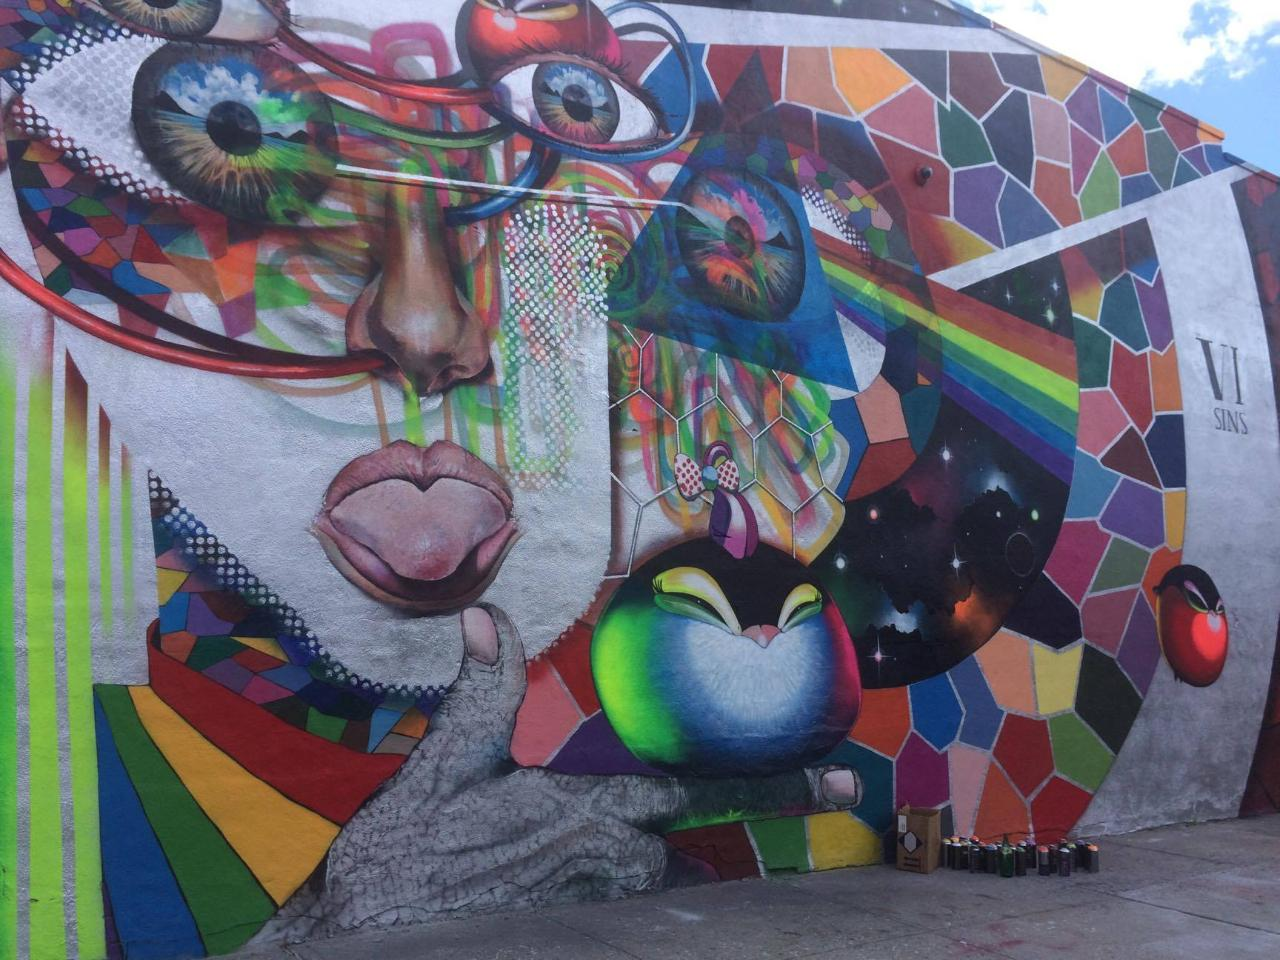 2H - A la découverte du Street Art à Bushwick (Brooklyn)